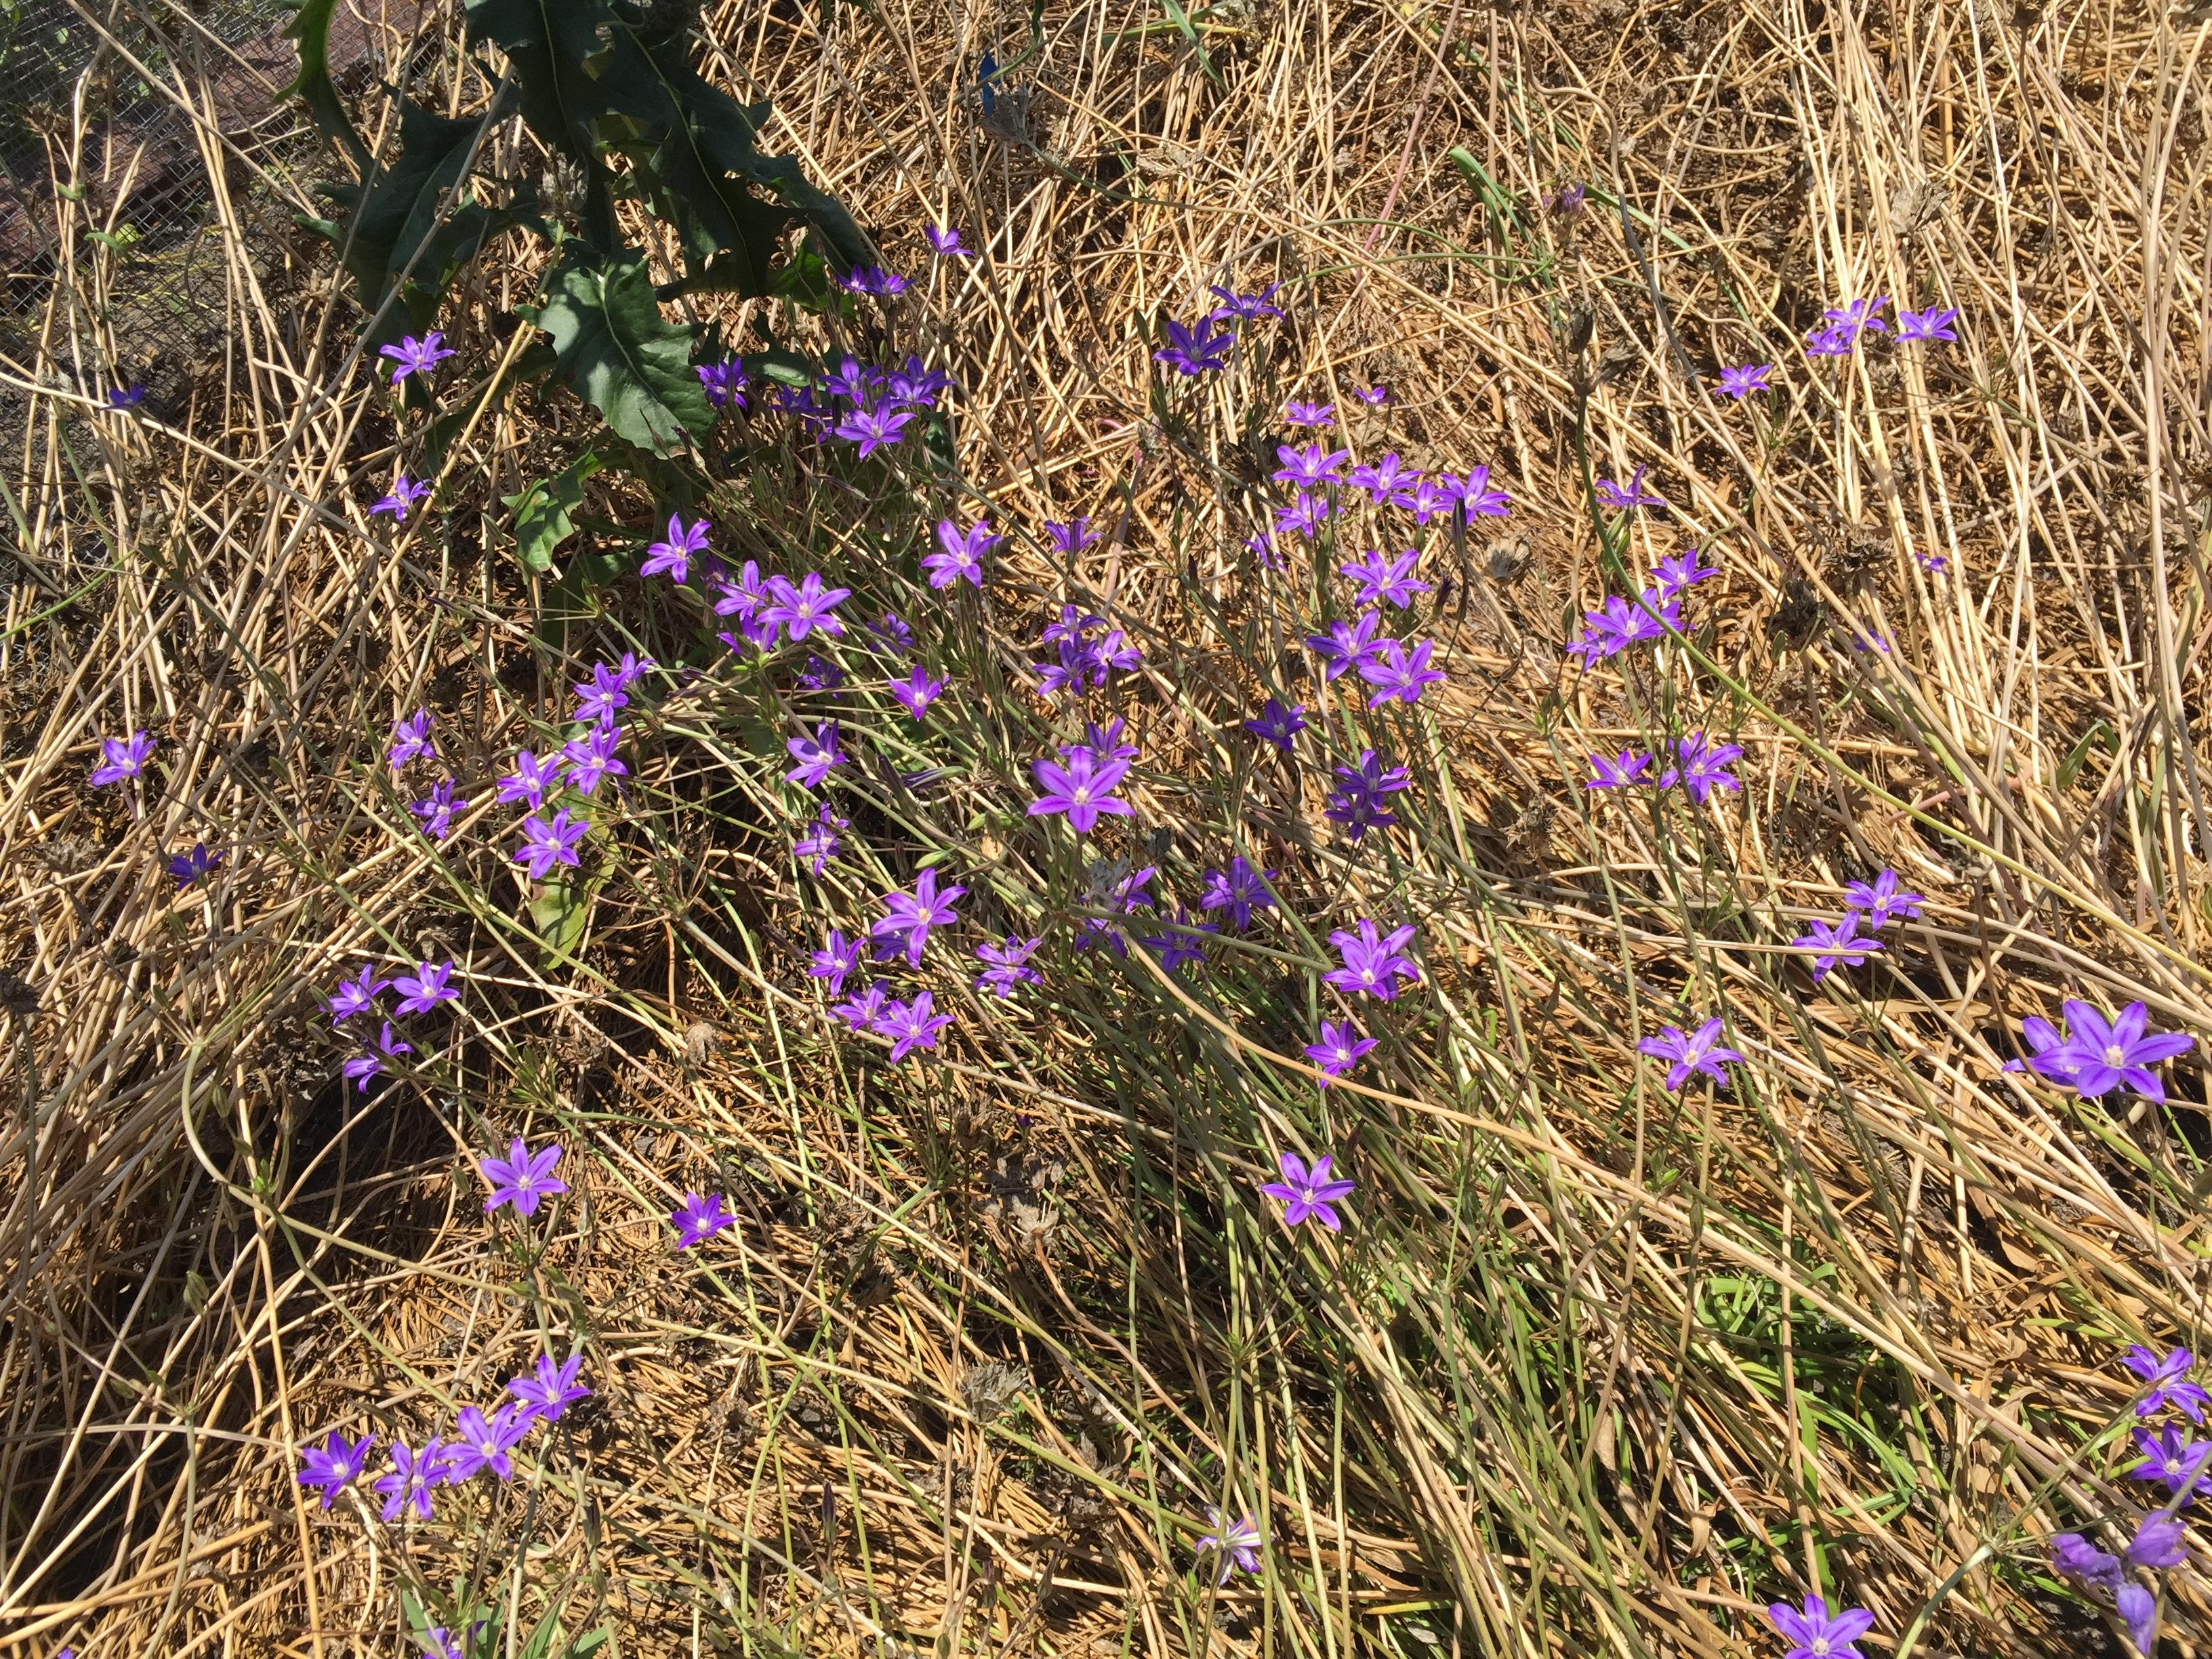 Brodiaea blooming